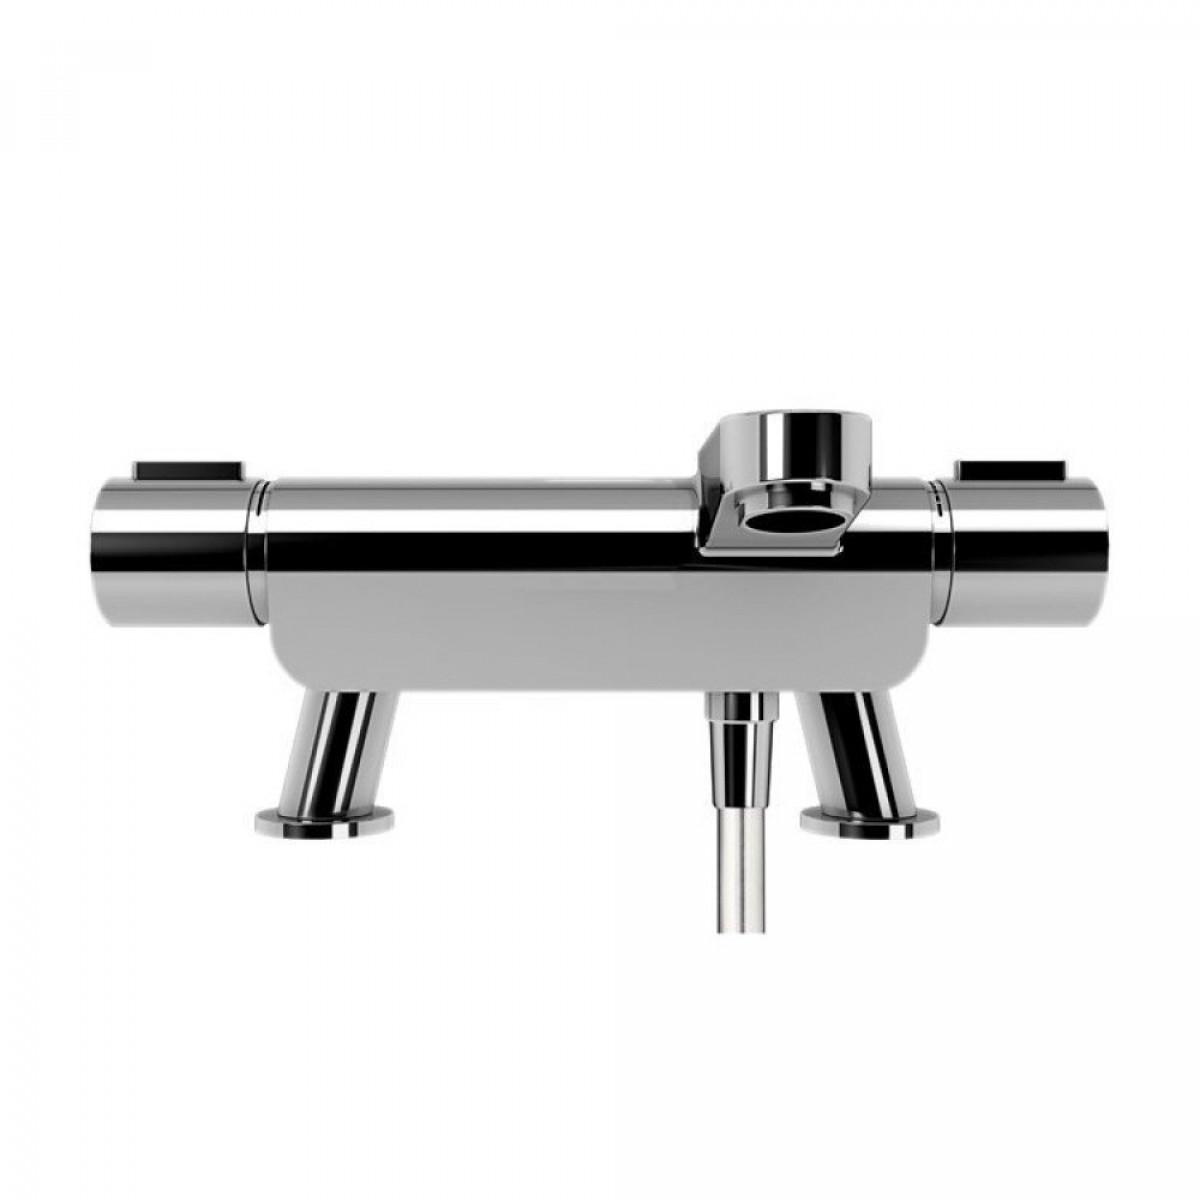 aqualisa midas 220 bath shower mixer md220bsm aqualisa aquamixa thermo bath shower mixer with exposed